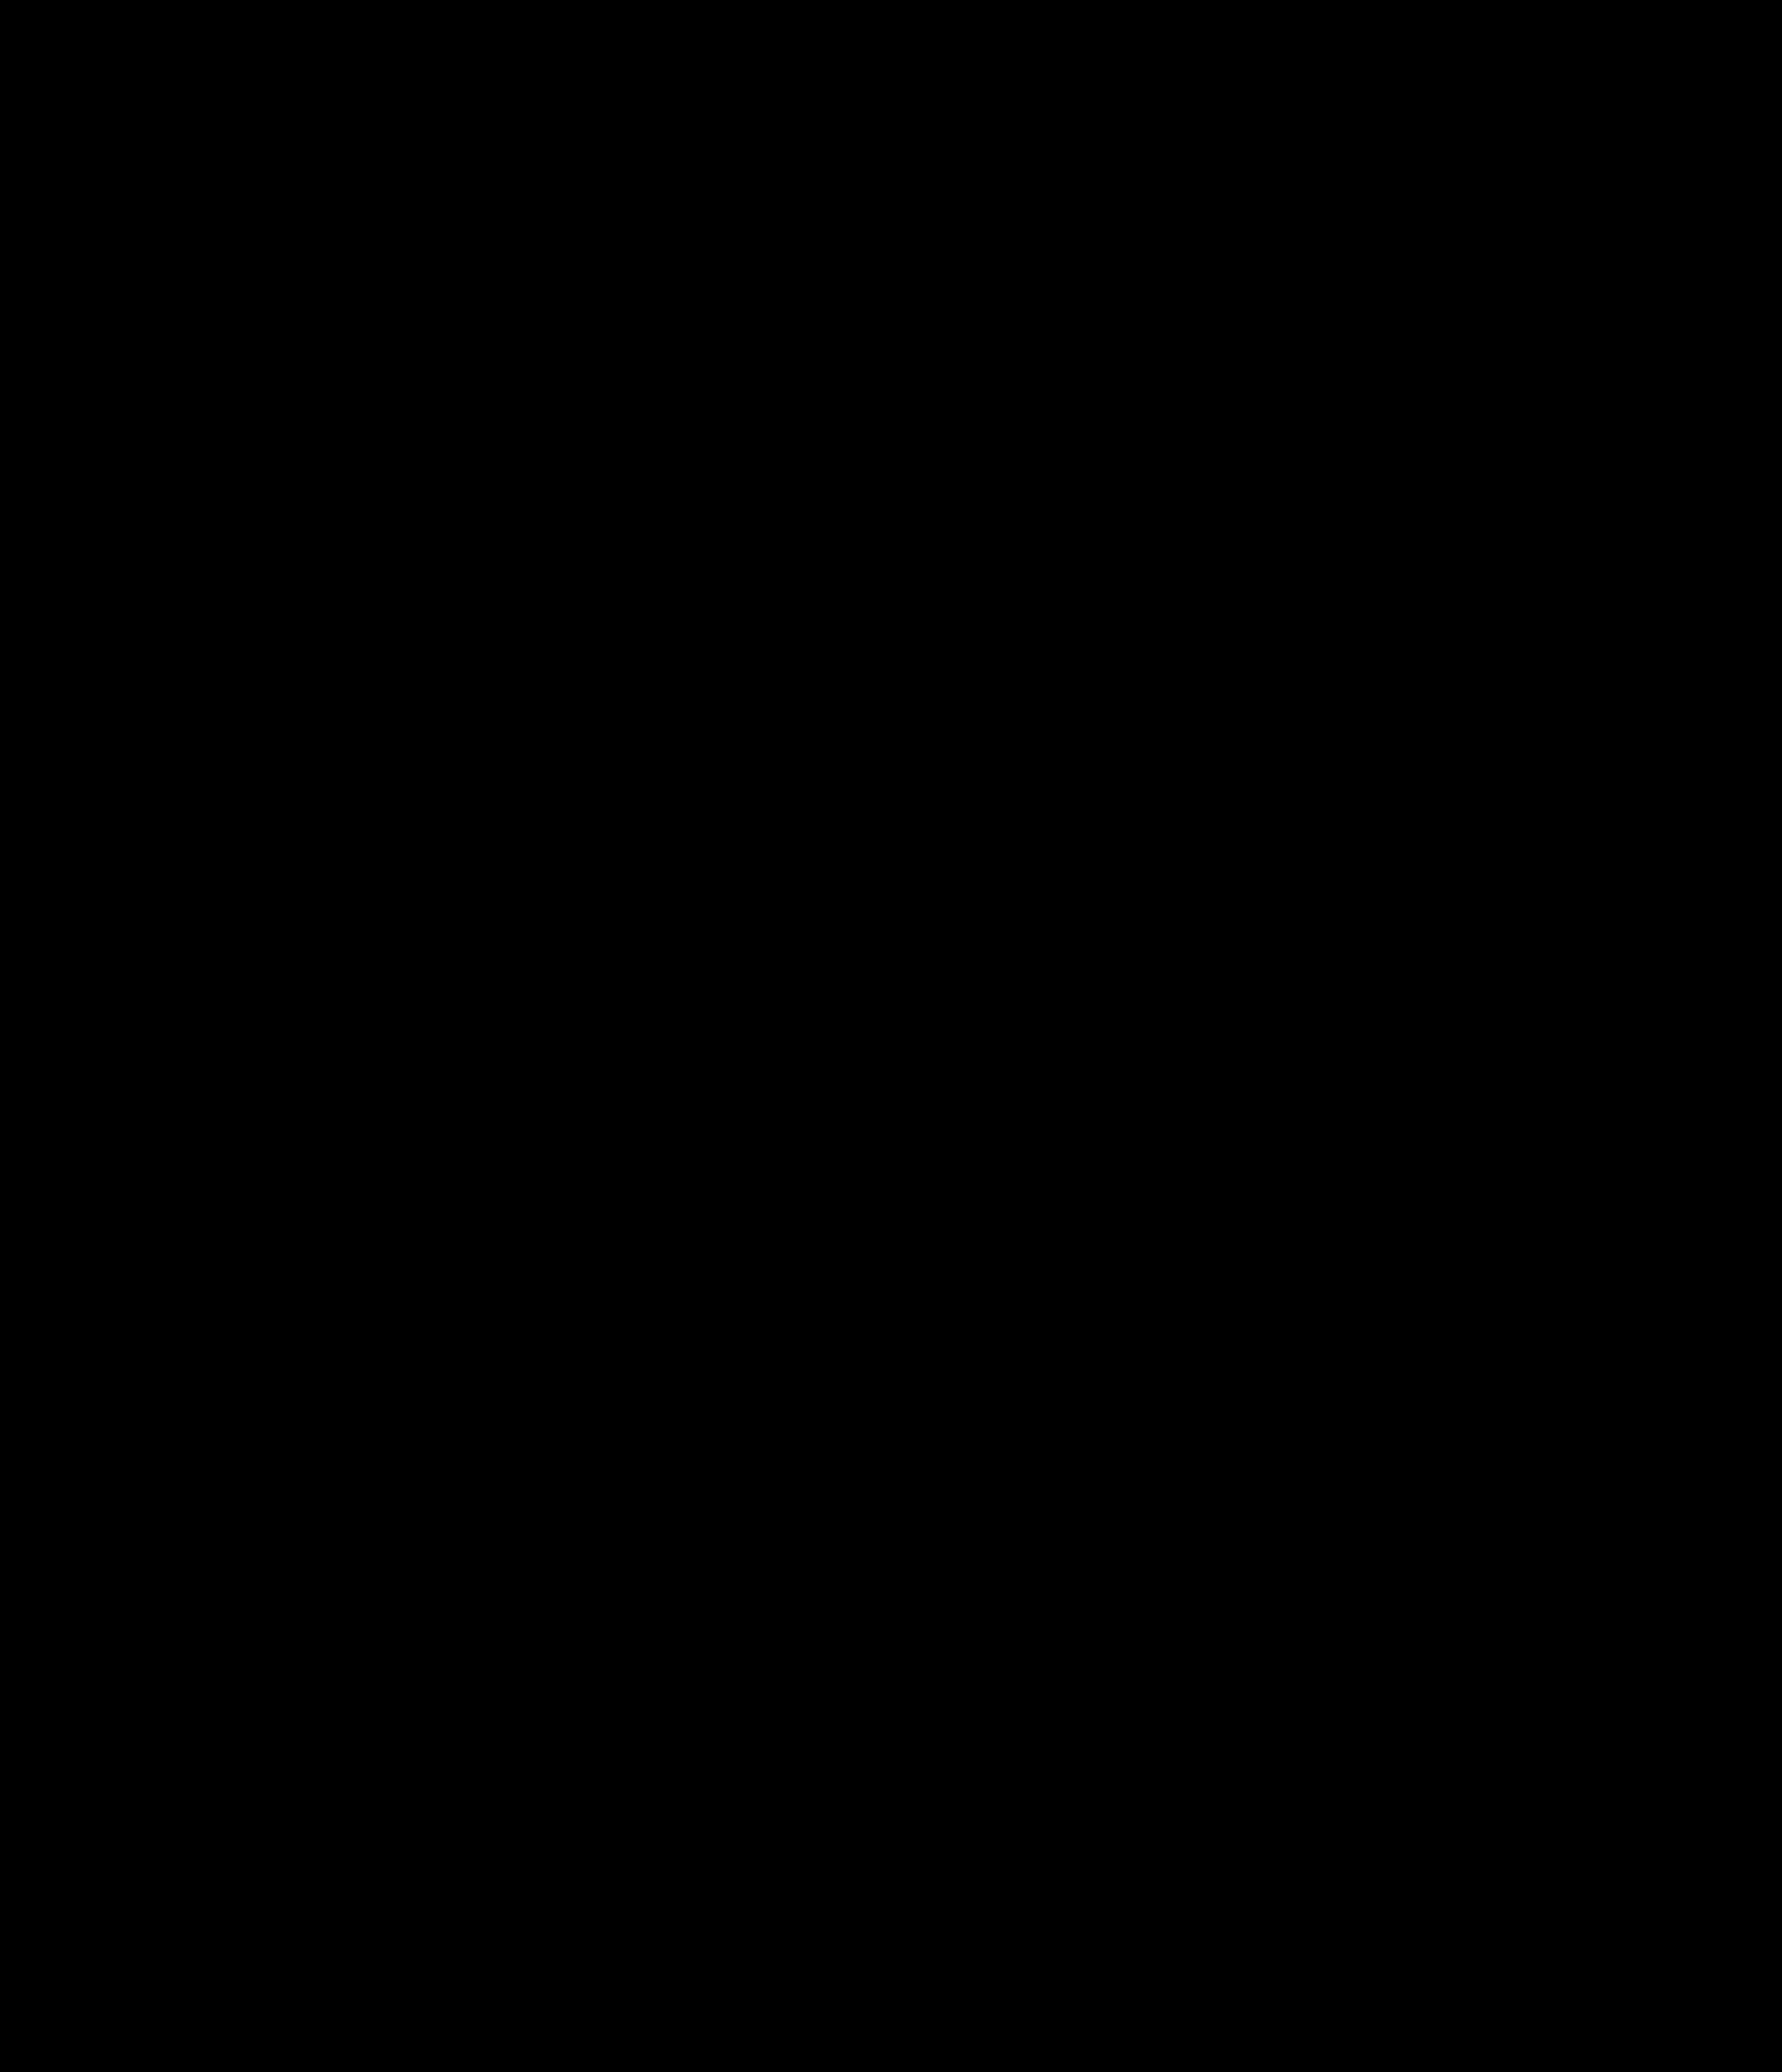 Kuchyňská baterie SCHOCK PIEGA Cristadur® Magma 547120